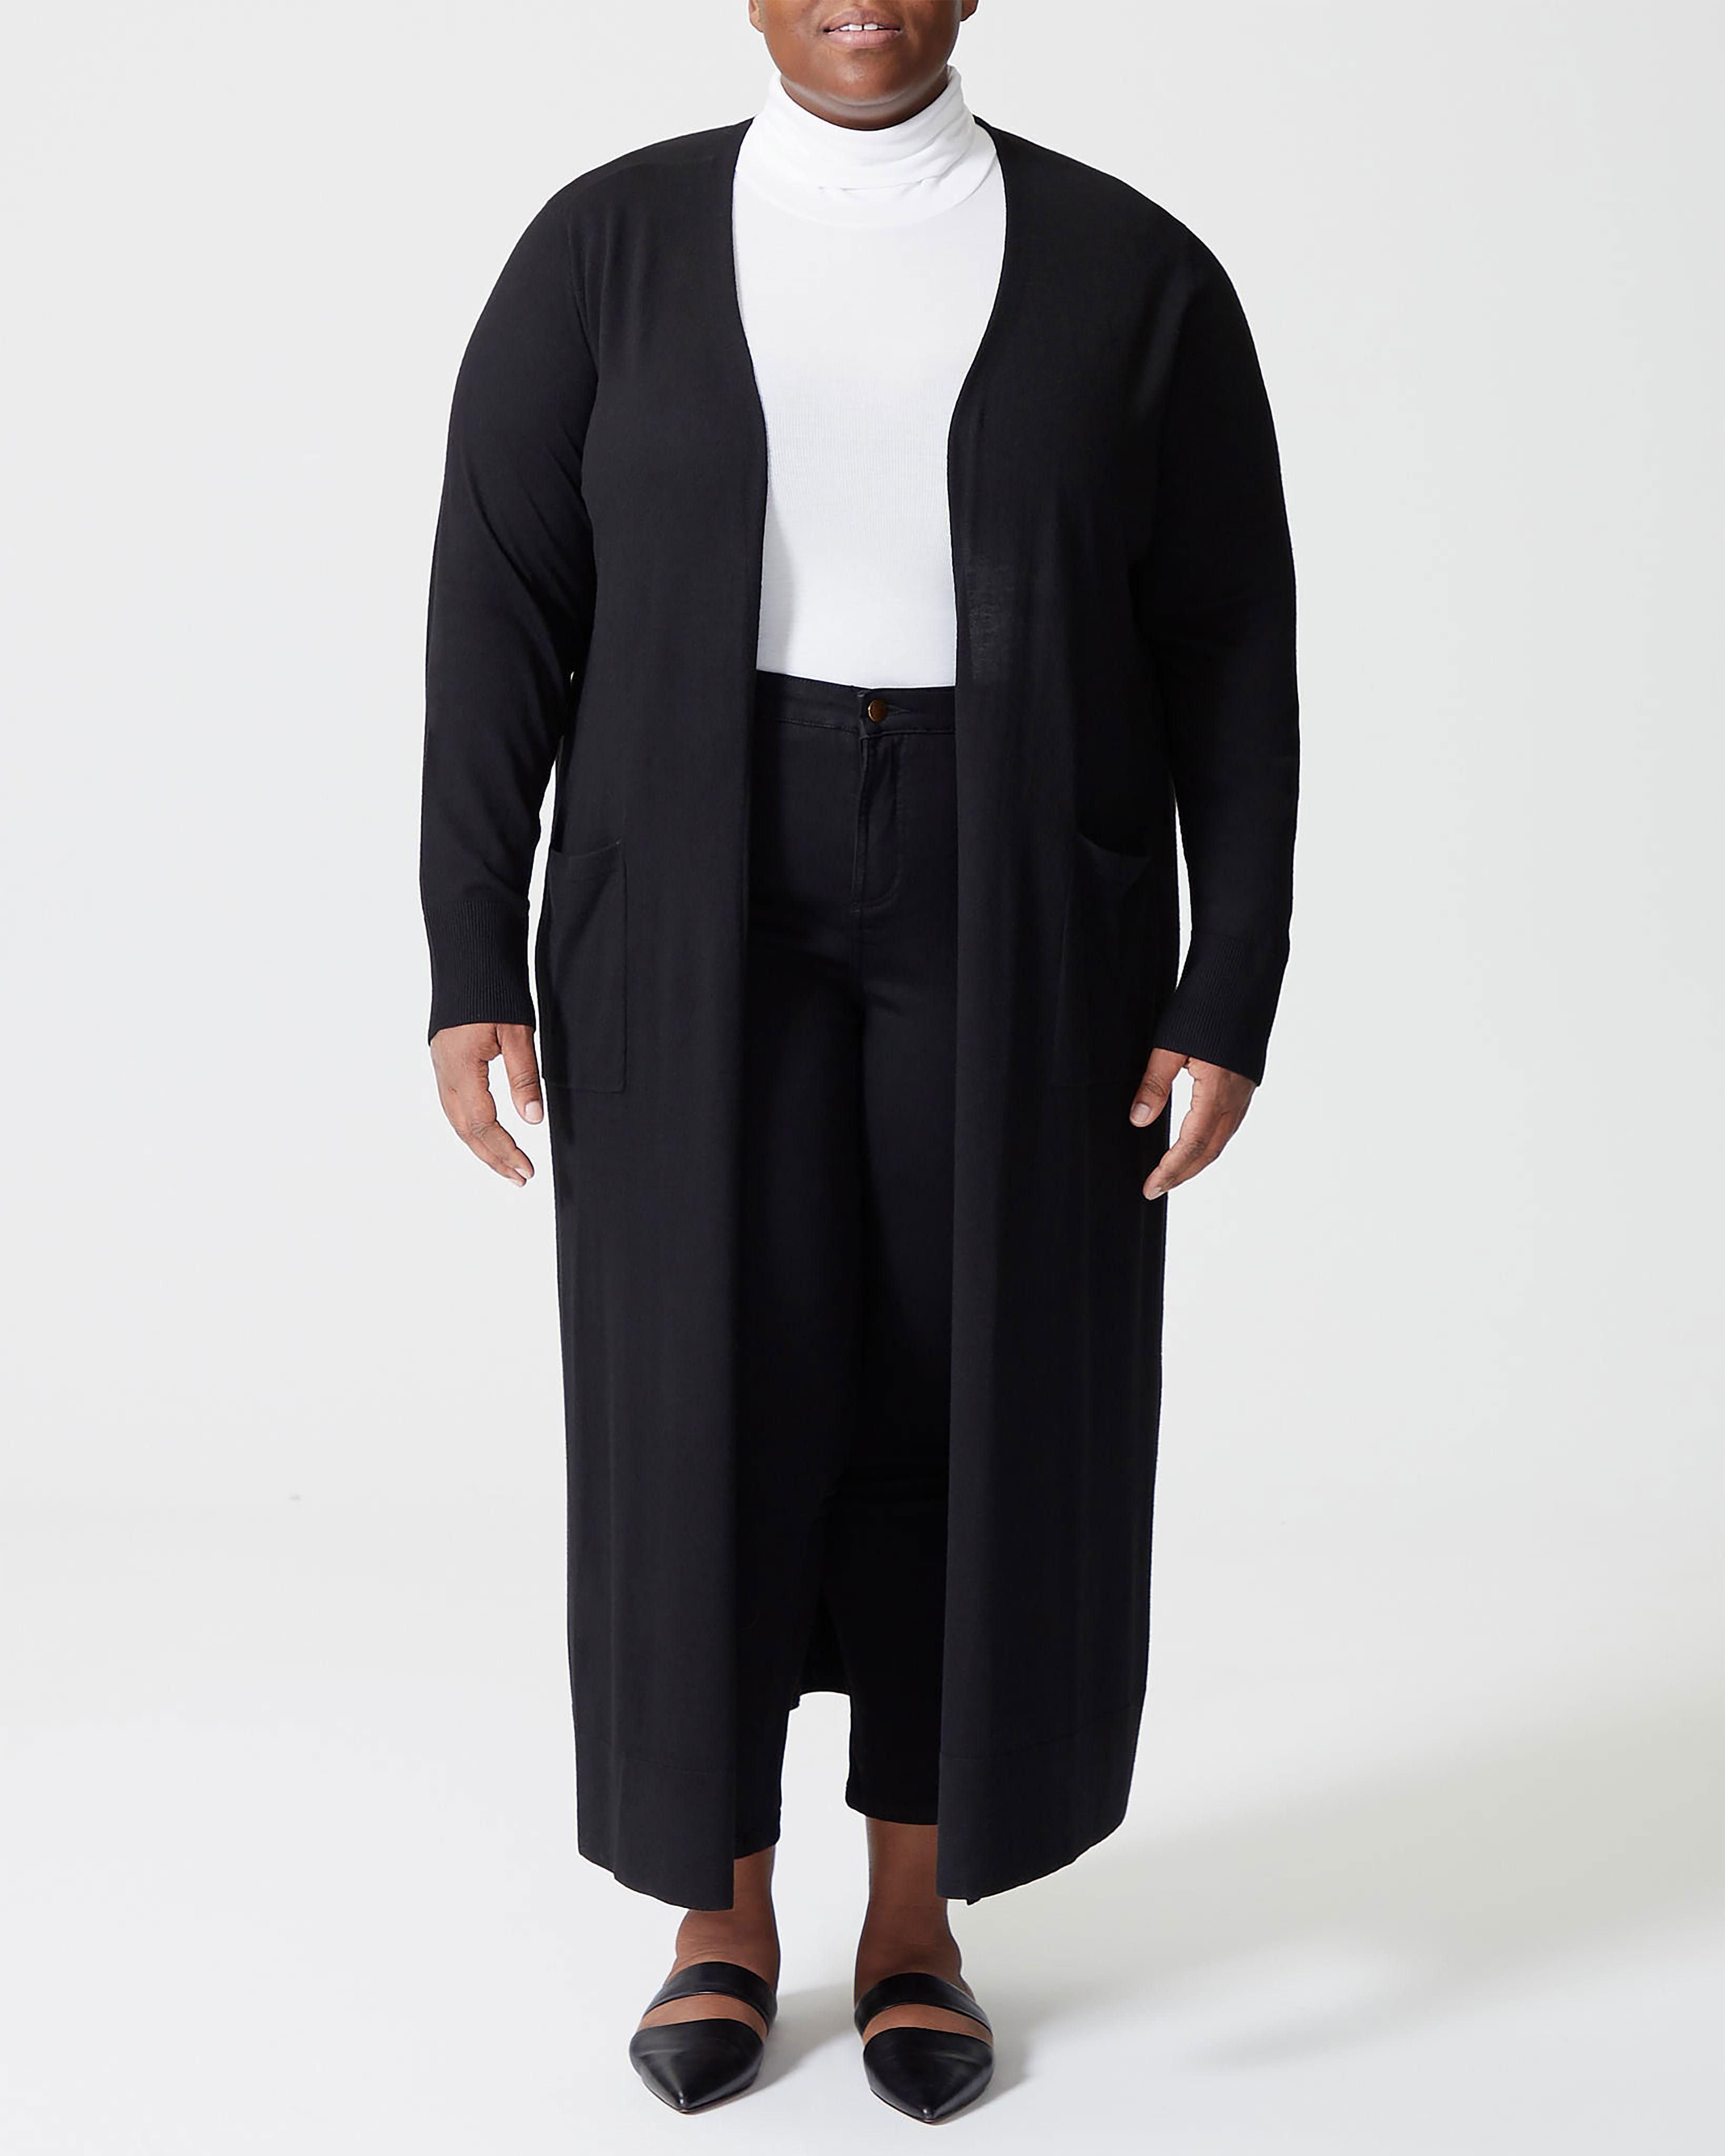 Lennox Long Sweater - Black